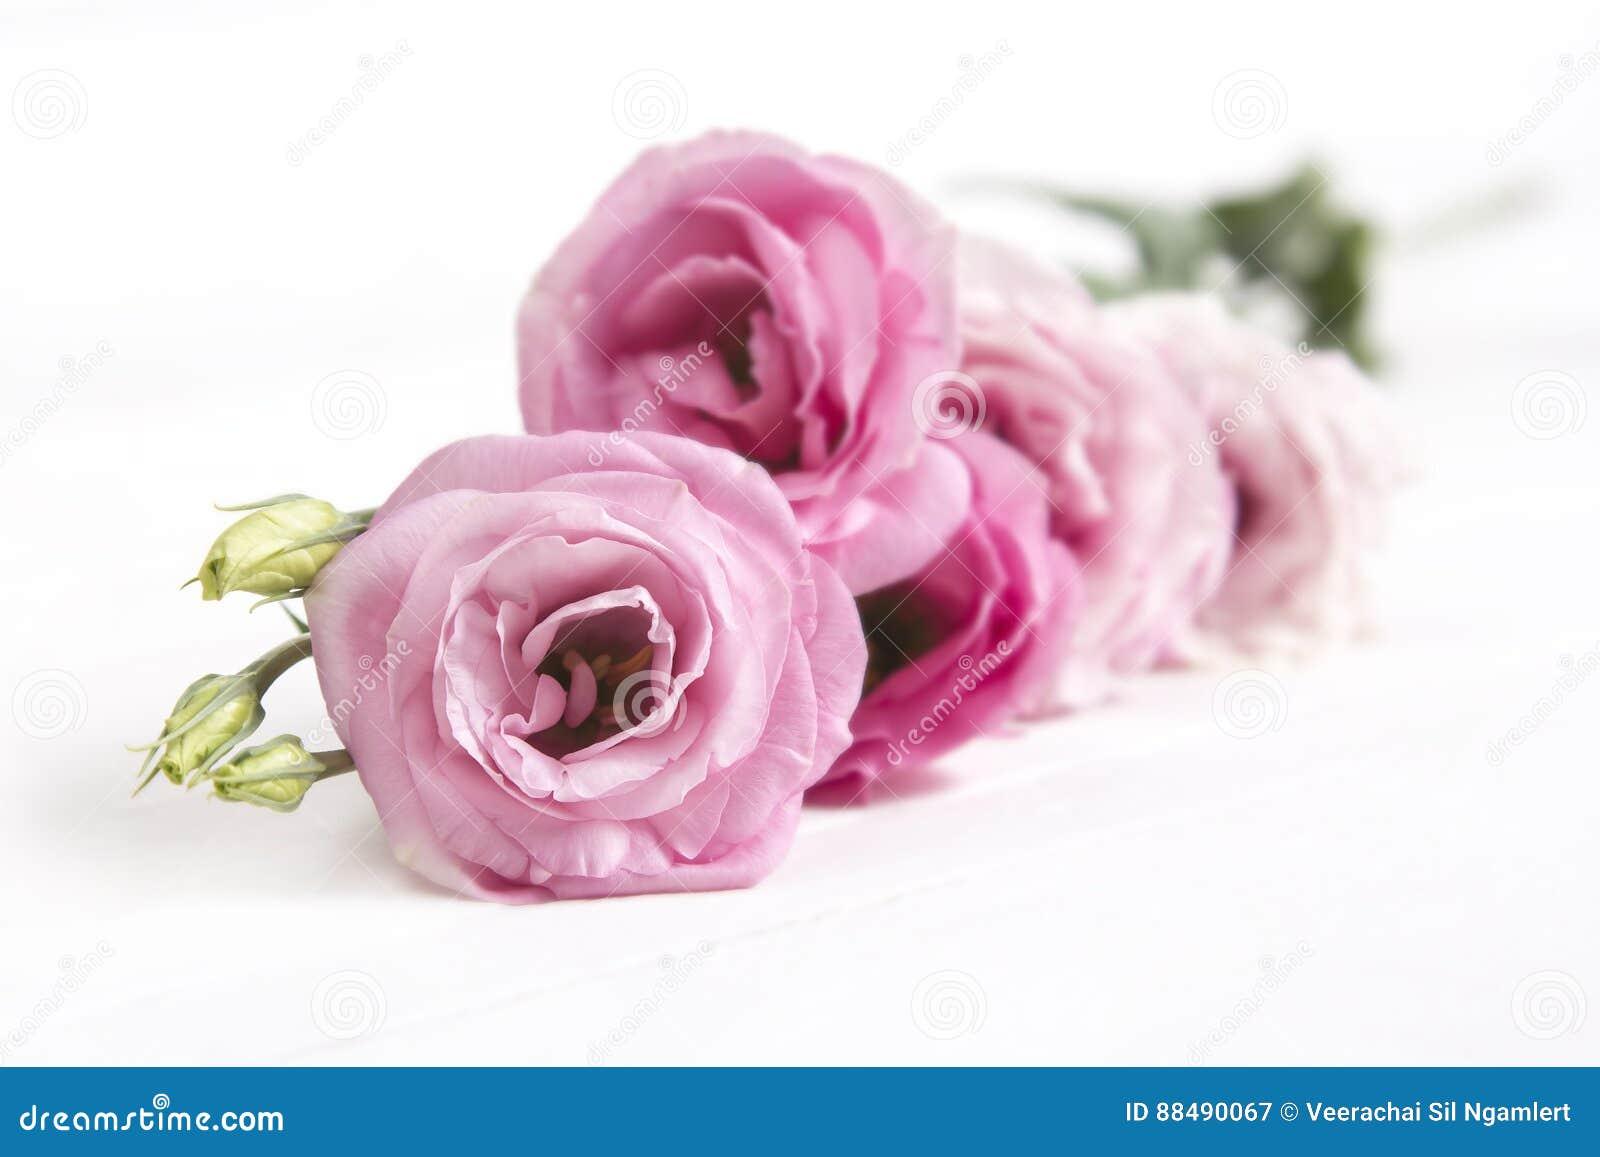 Beautiful Lisianthus Flower Bouquet On White Background Stock Image